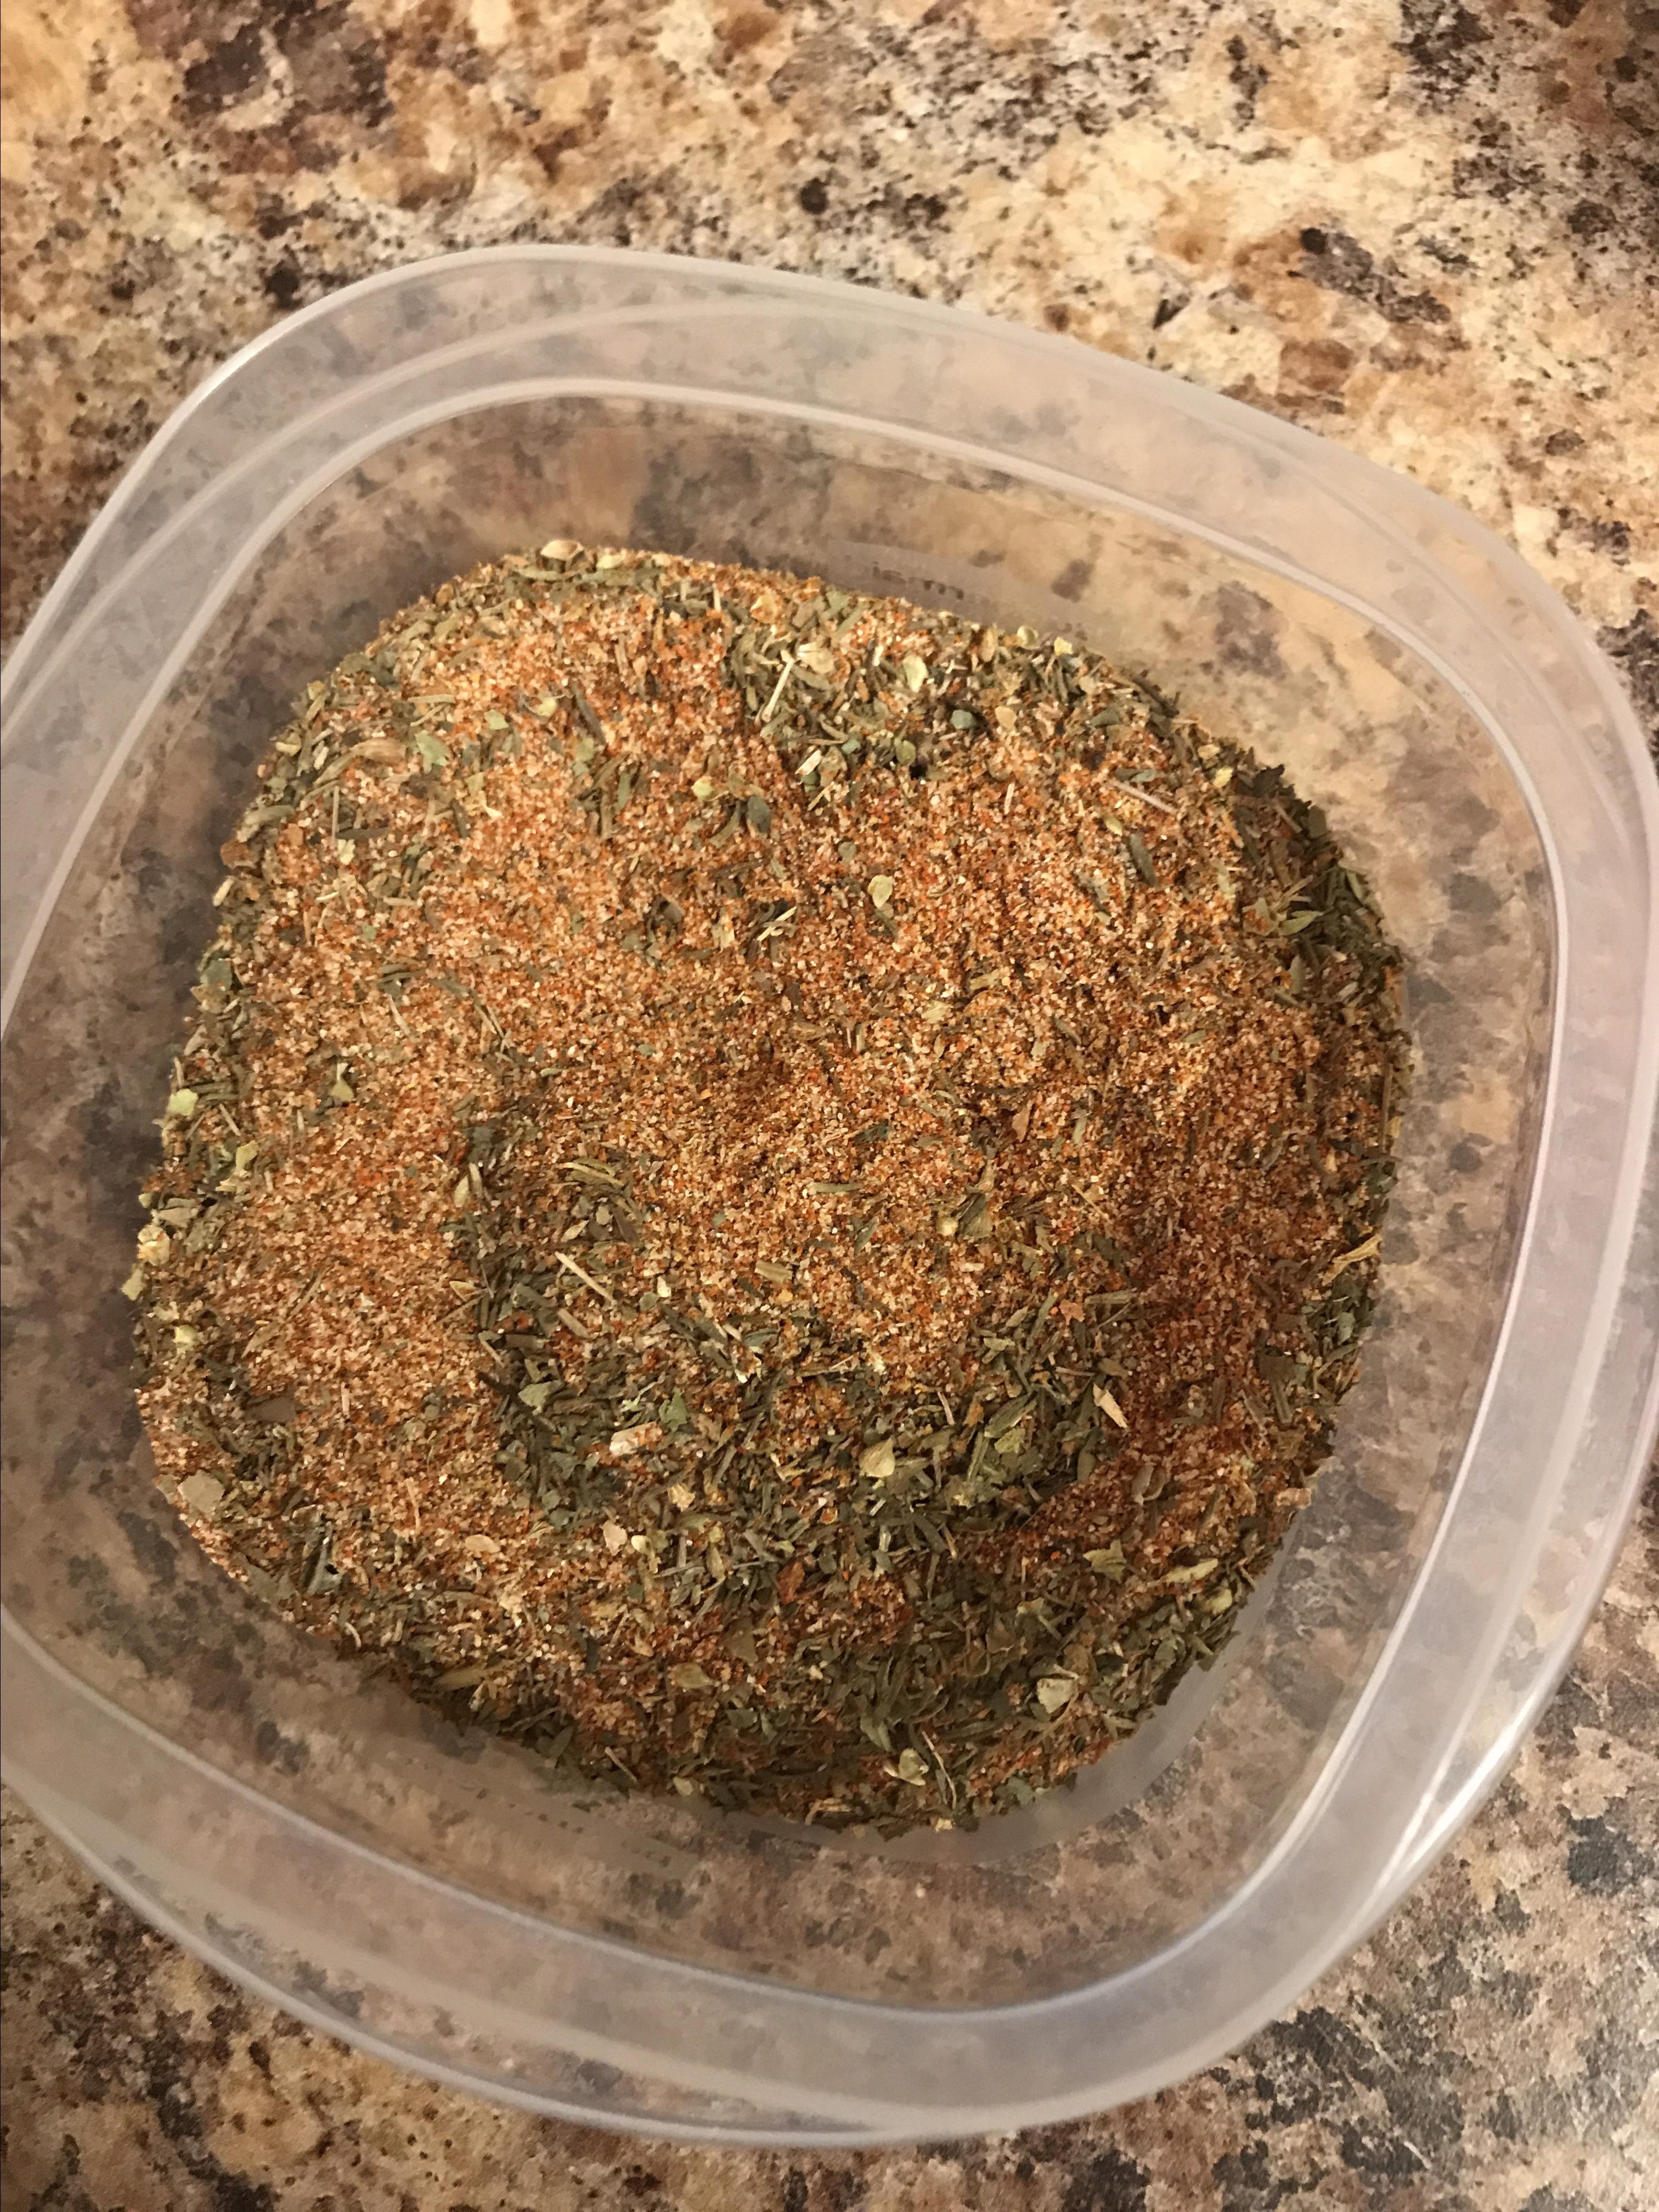 Blackened Seasoning Mix